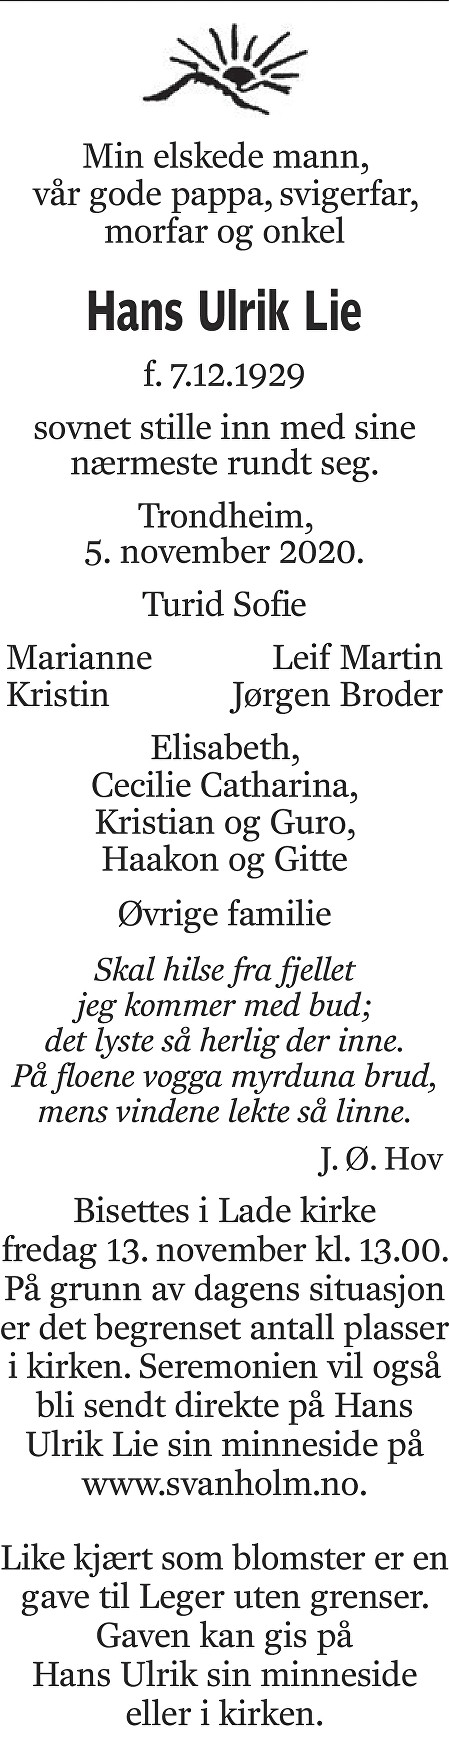 Hans Ulrik Lie Dødsannonse